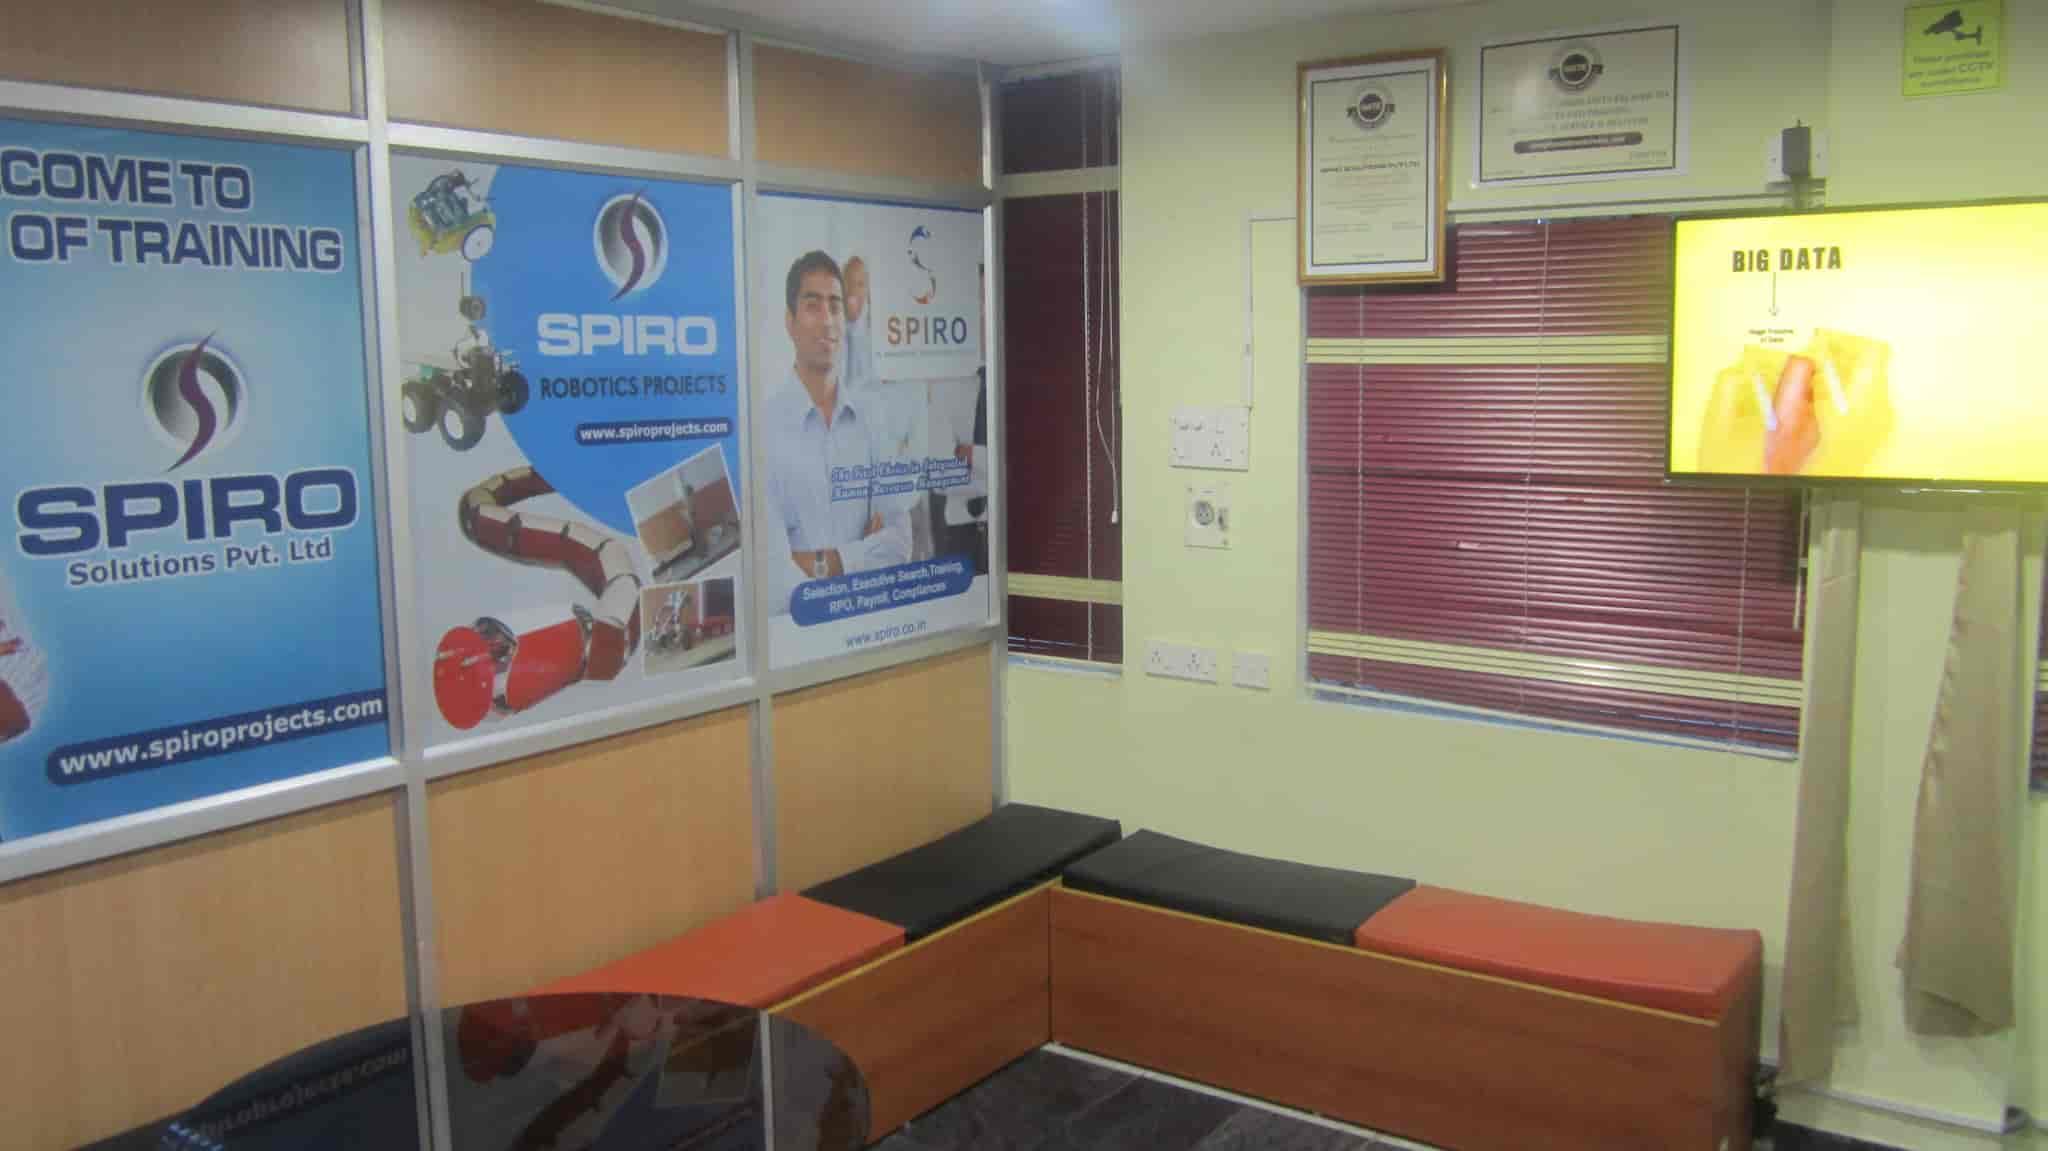 Spiro Solutions Pvt Ltd, T Nagar - Project Consultants in Chennai